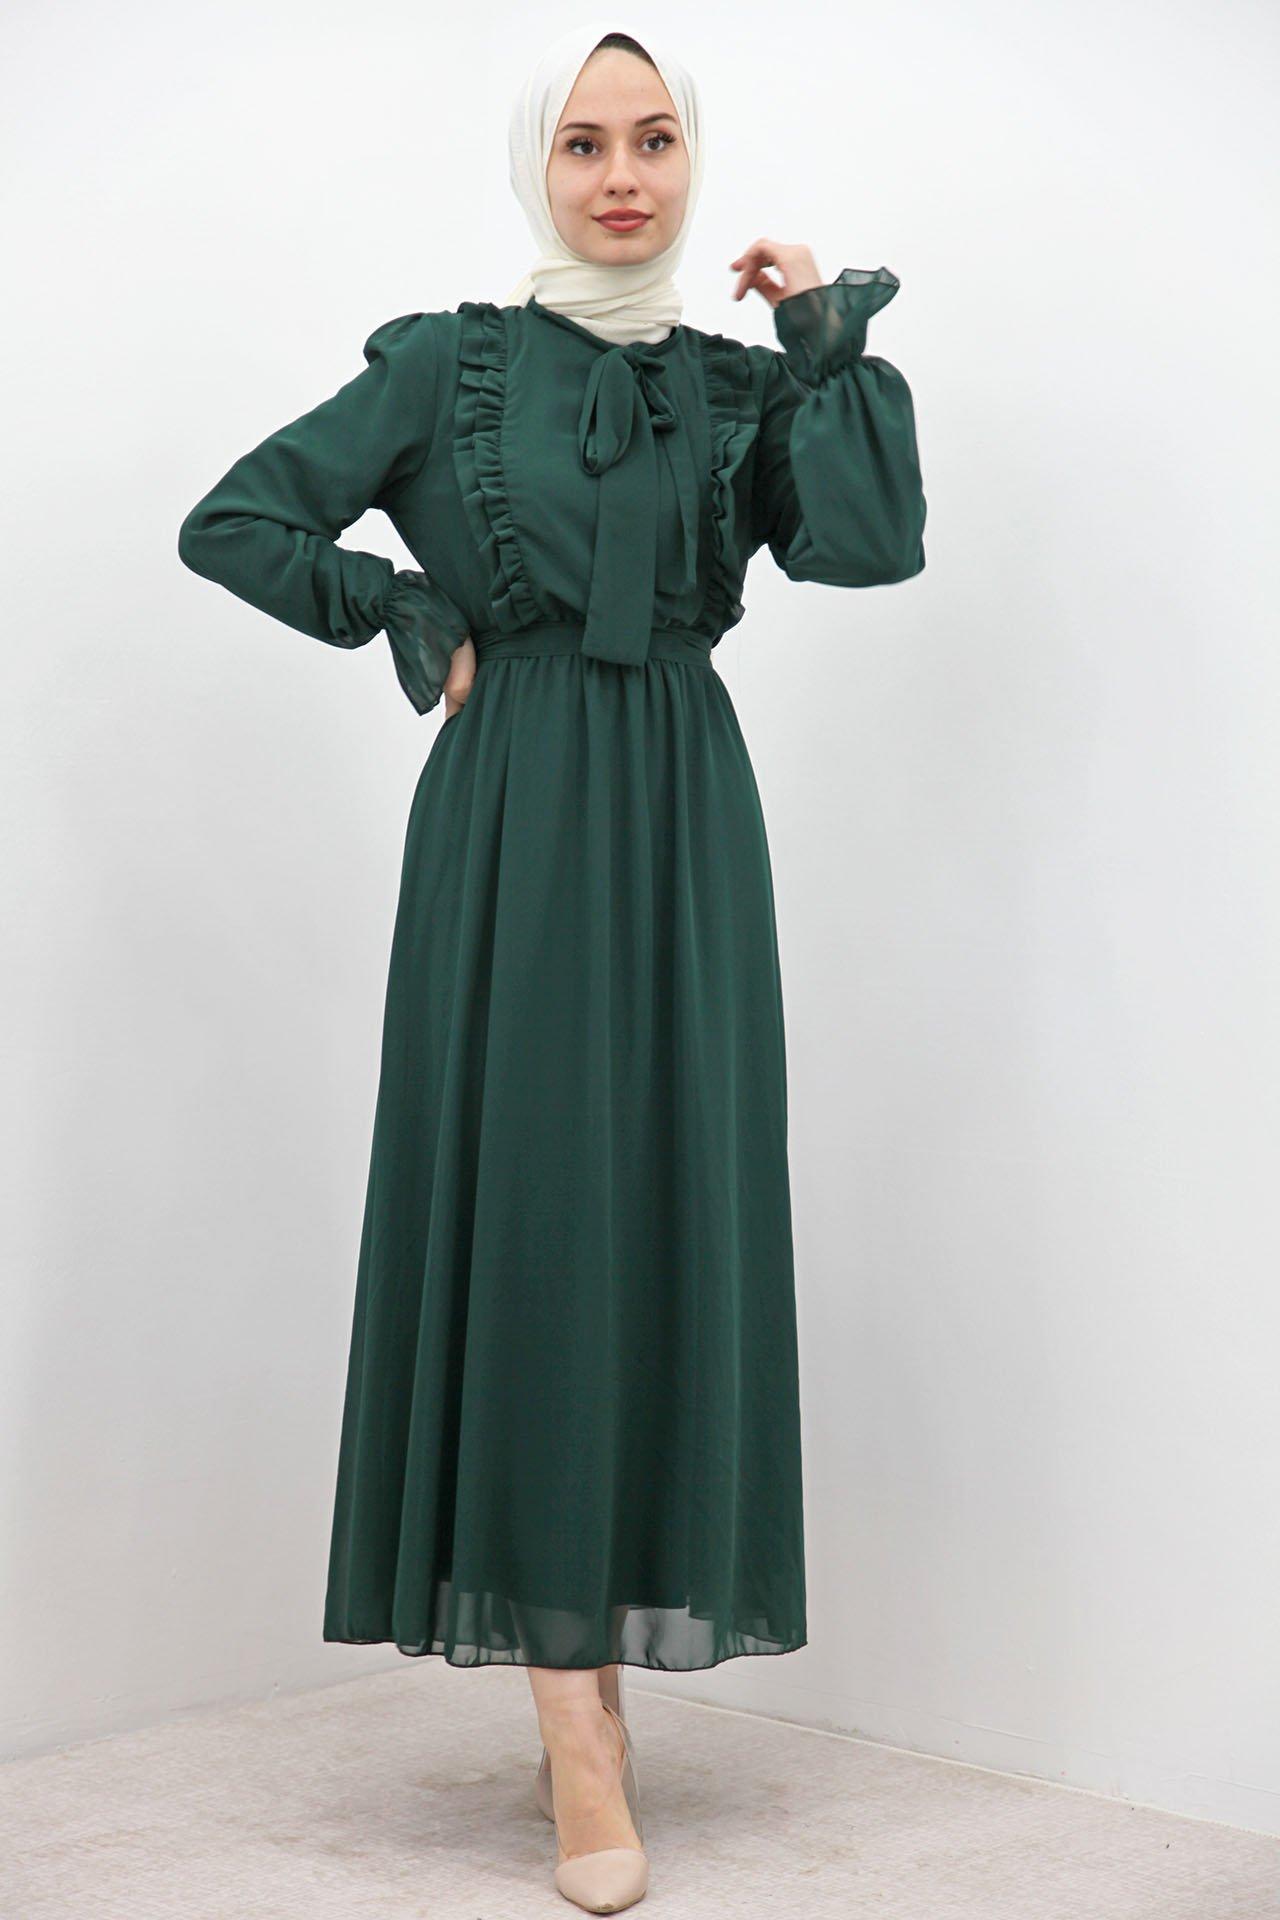 GİZAGİYİM - Beli Lastikli Fırfırlı Elbise Zümrüt